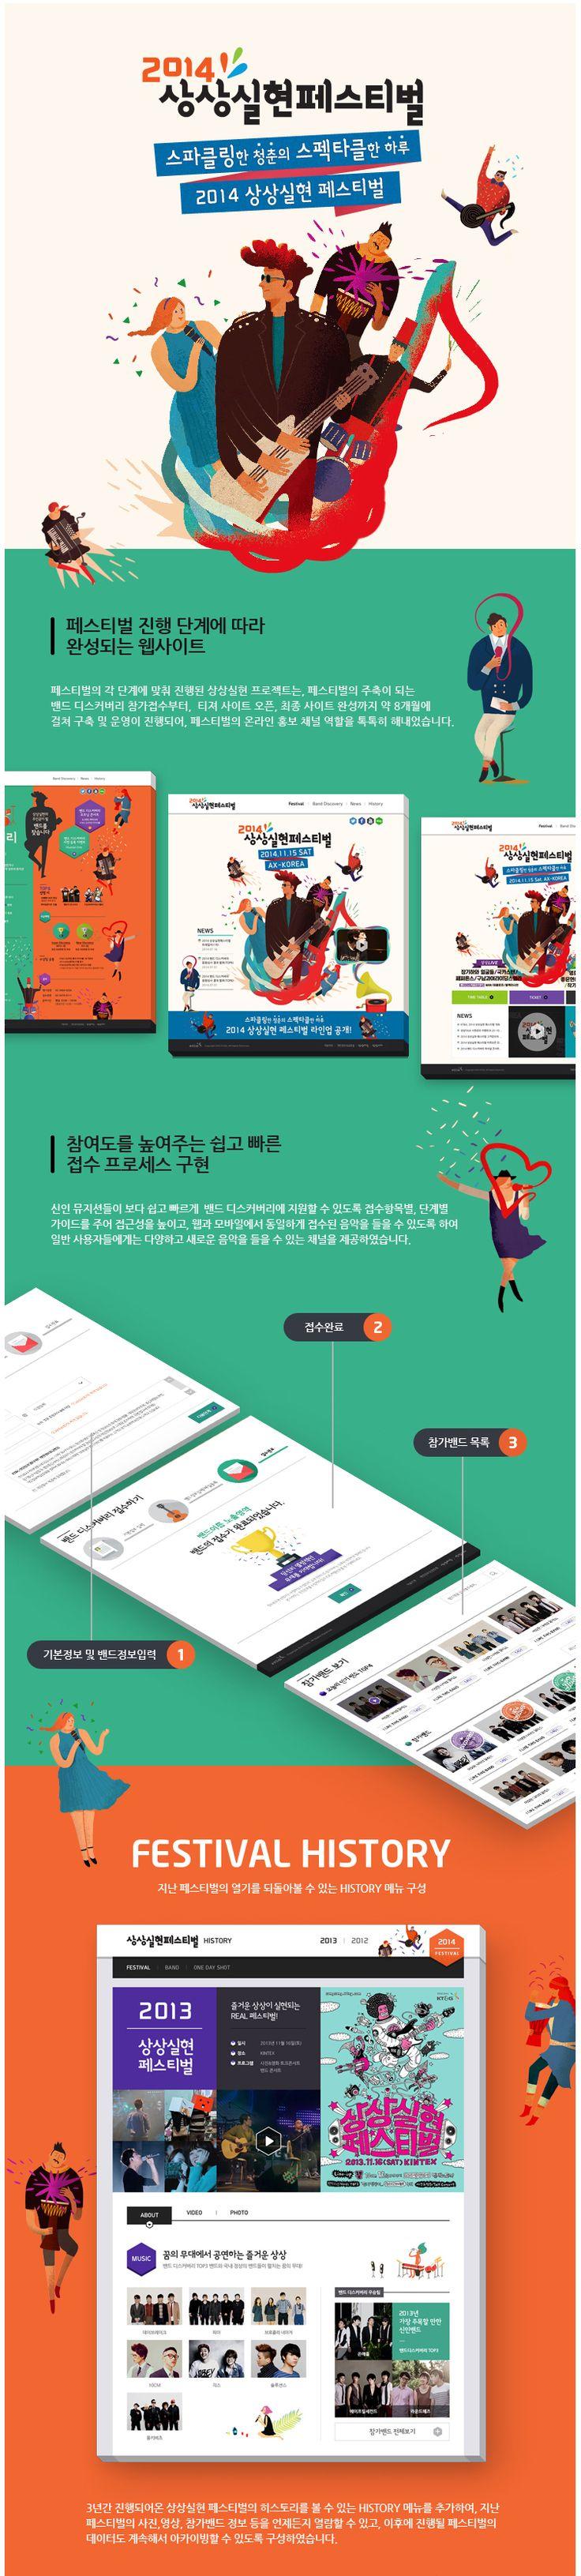 KT&G 2014 상상실현 웹사이트 구축+운영